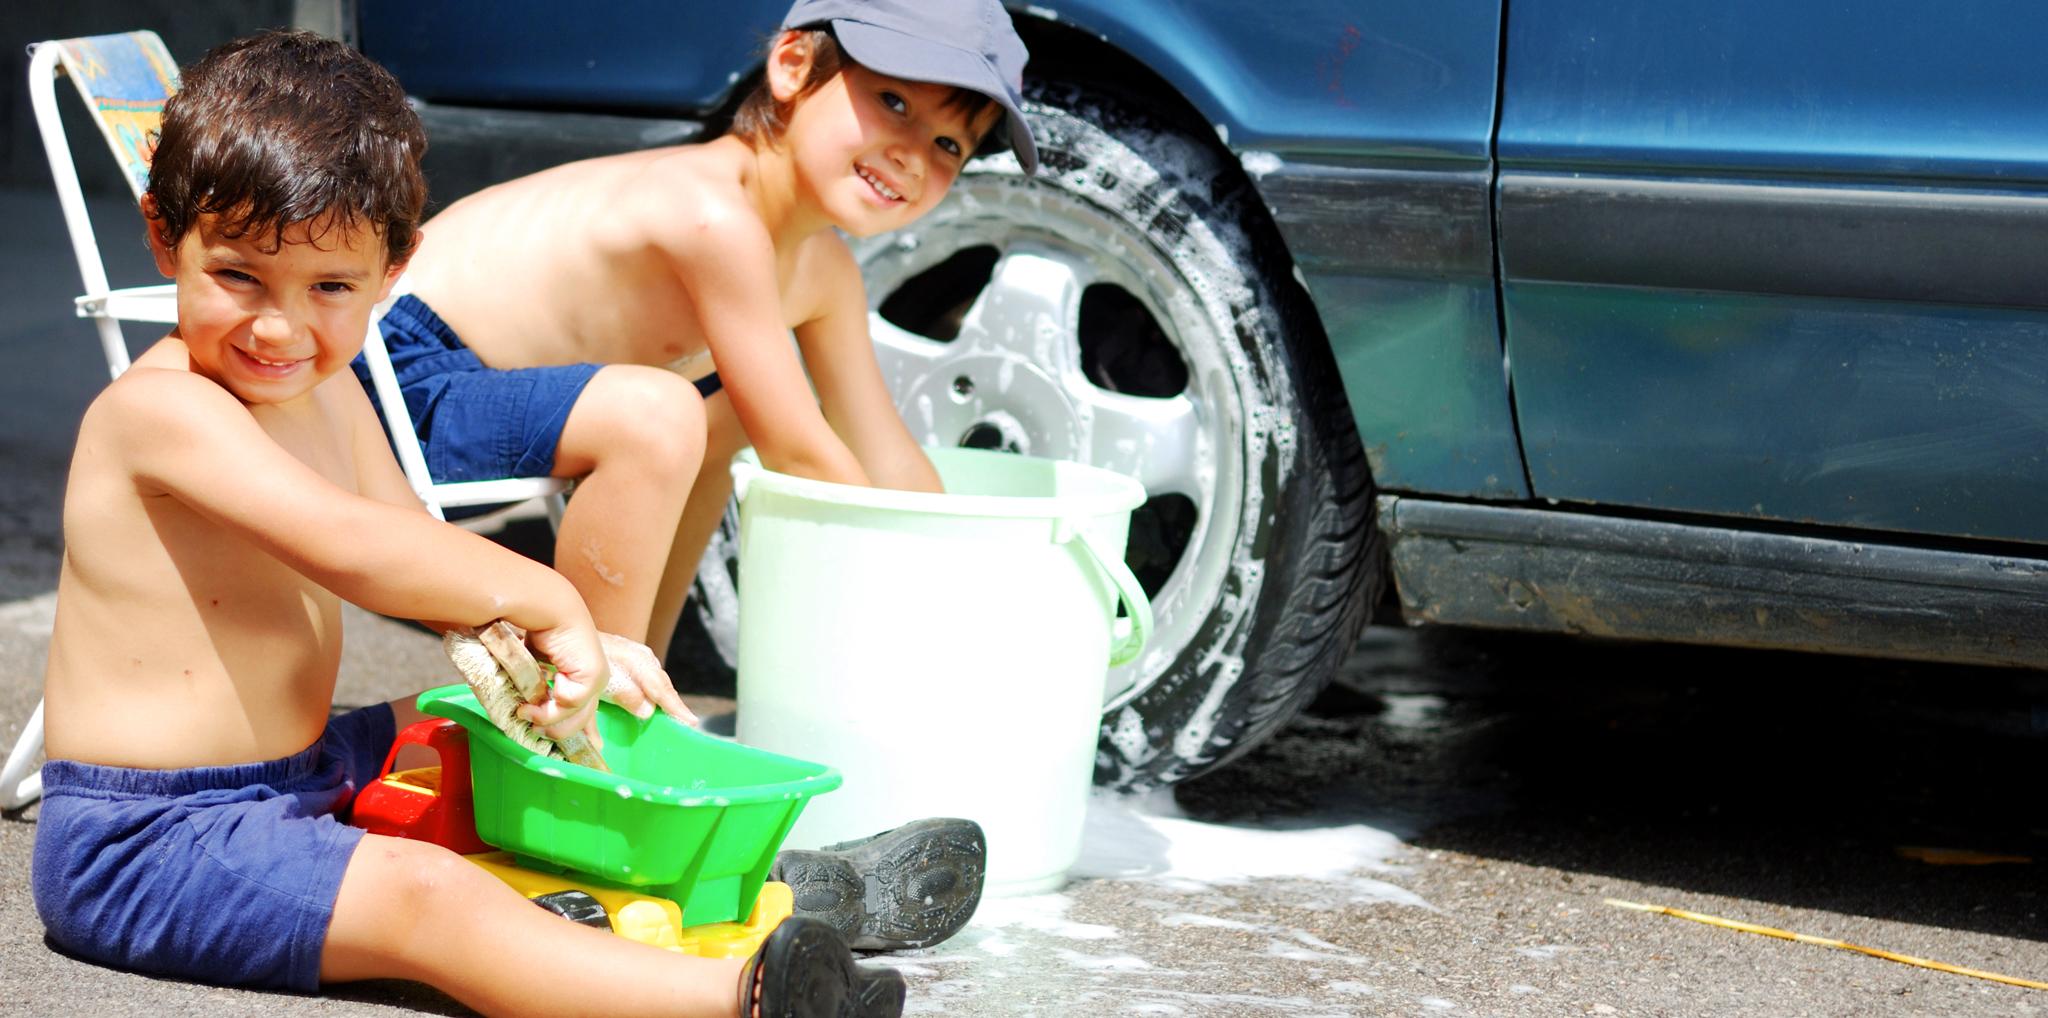 Child-Behavior-Patience-Empowers-Understanding.jpg